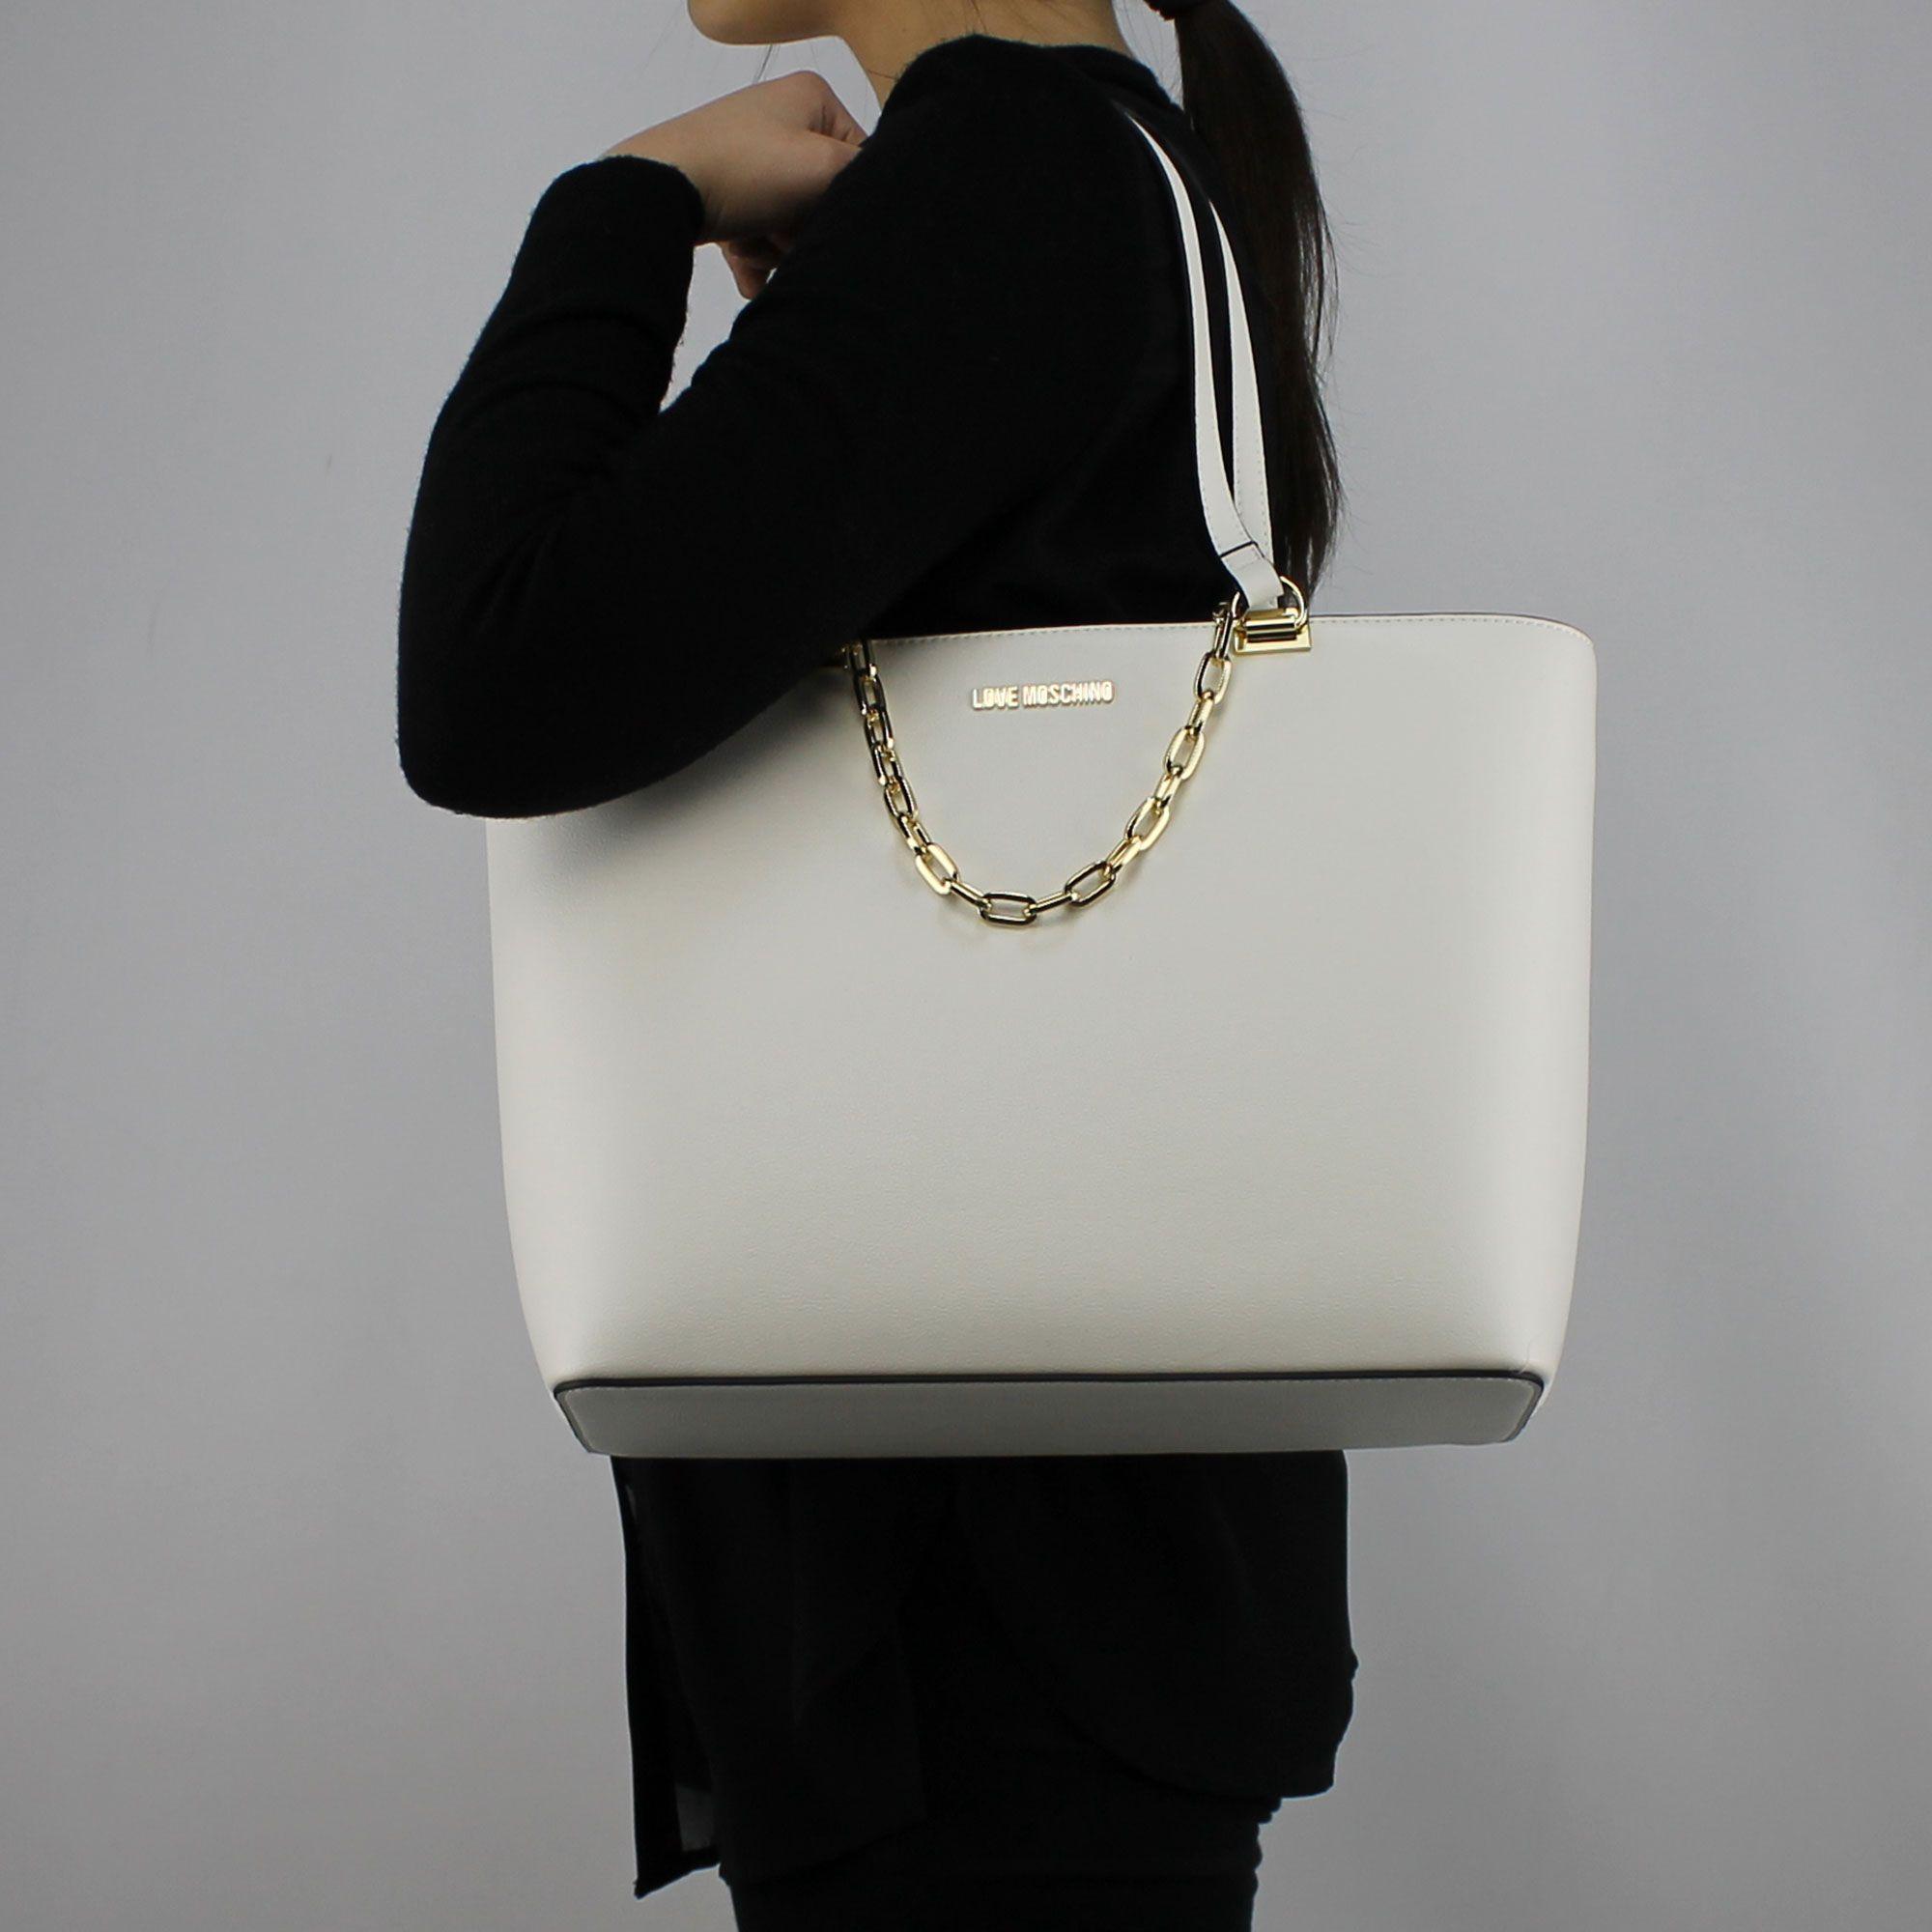 81b96c59ad Borsa shopping Love Moschino bianca con catena dorata JC4350PP05K70100